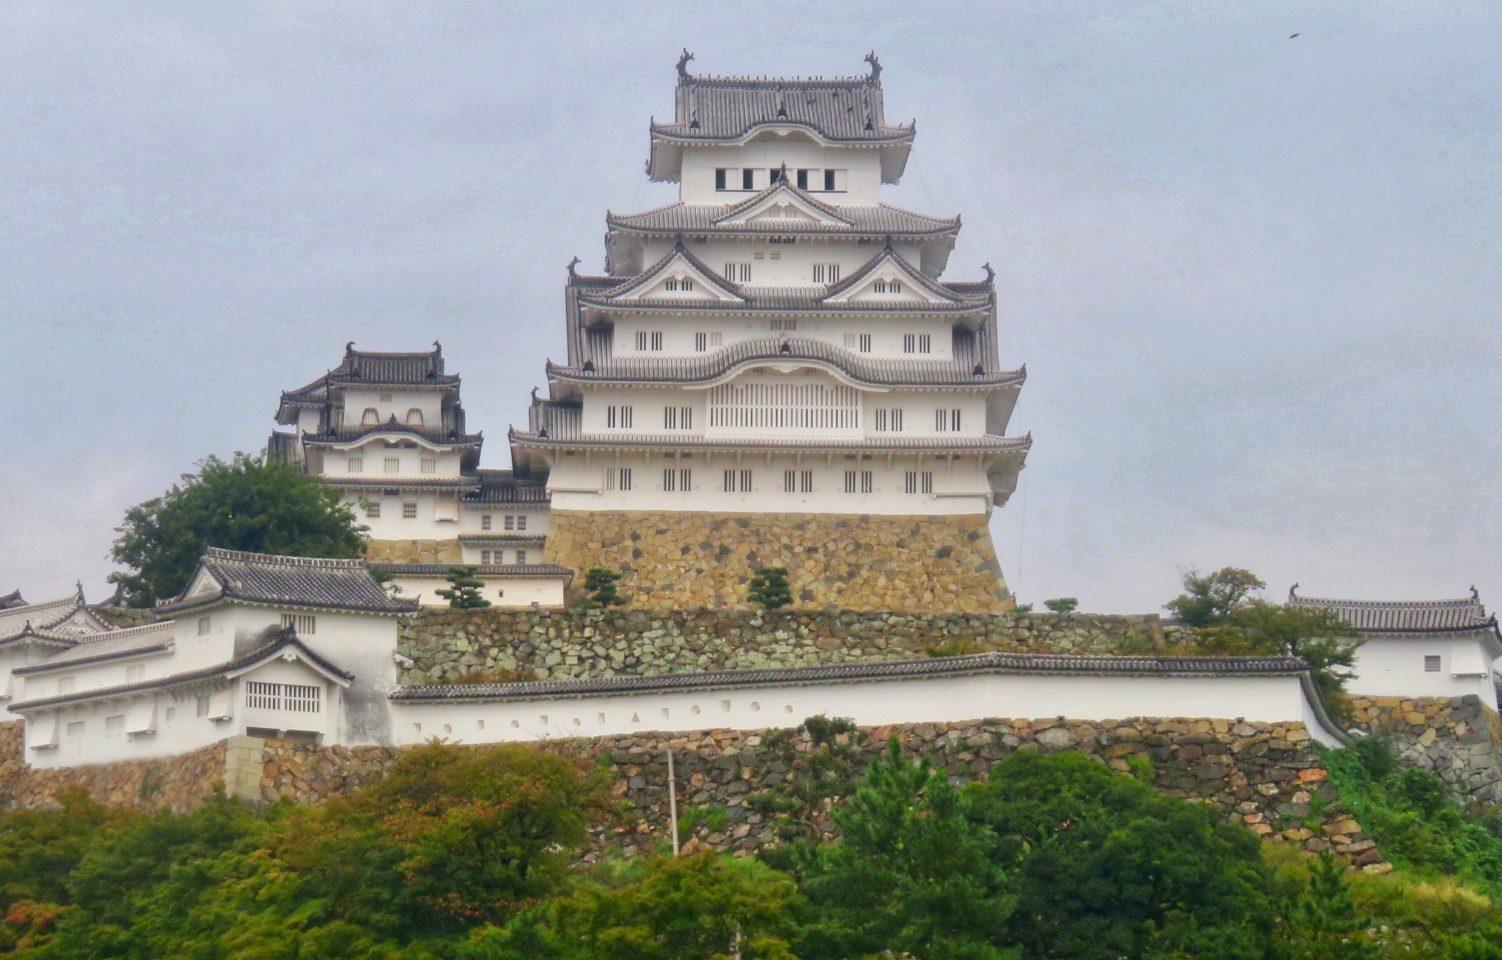 Japan Favorite Experiences ~ Himeji Castle in Himeji Japan